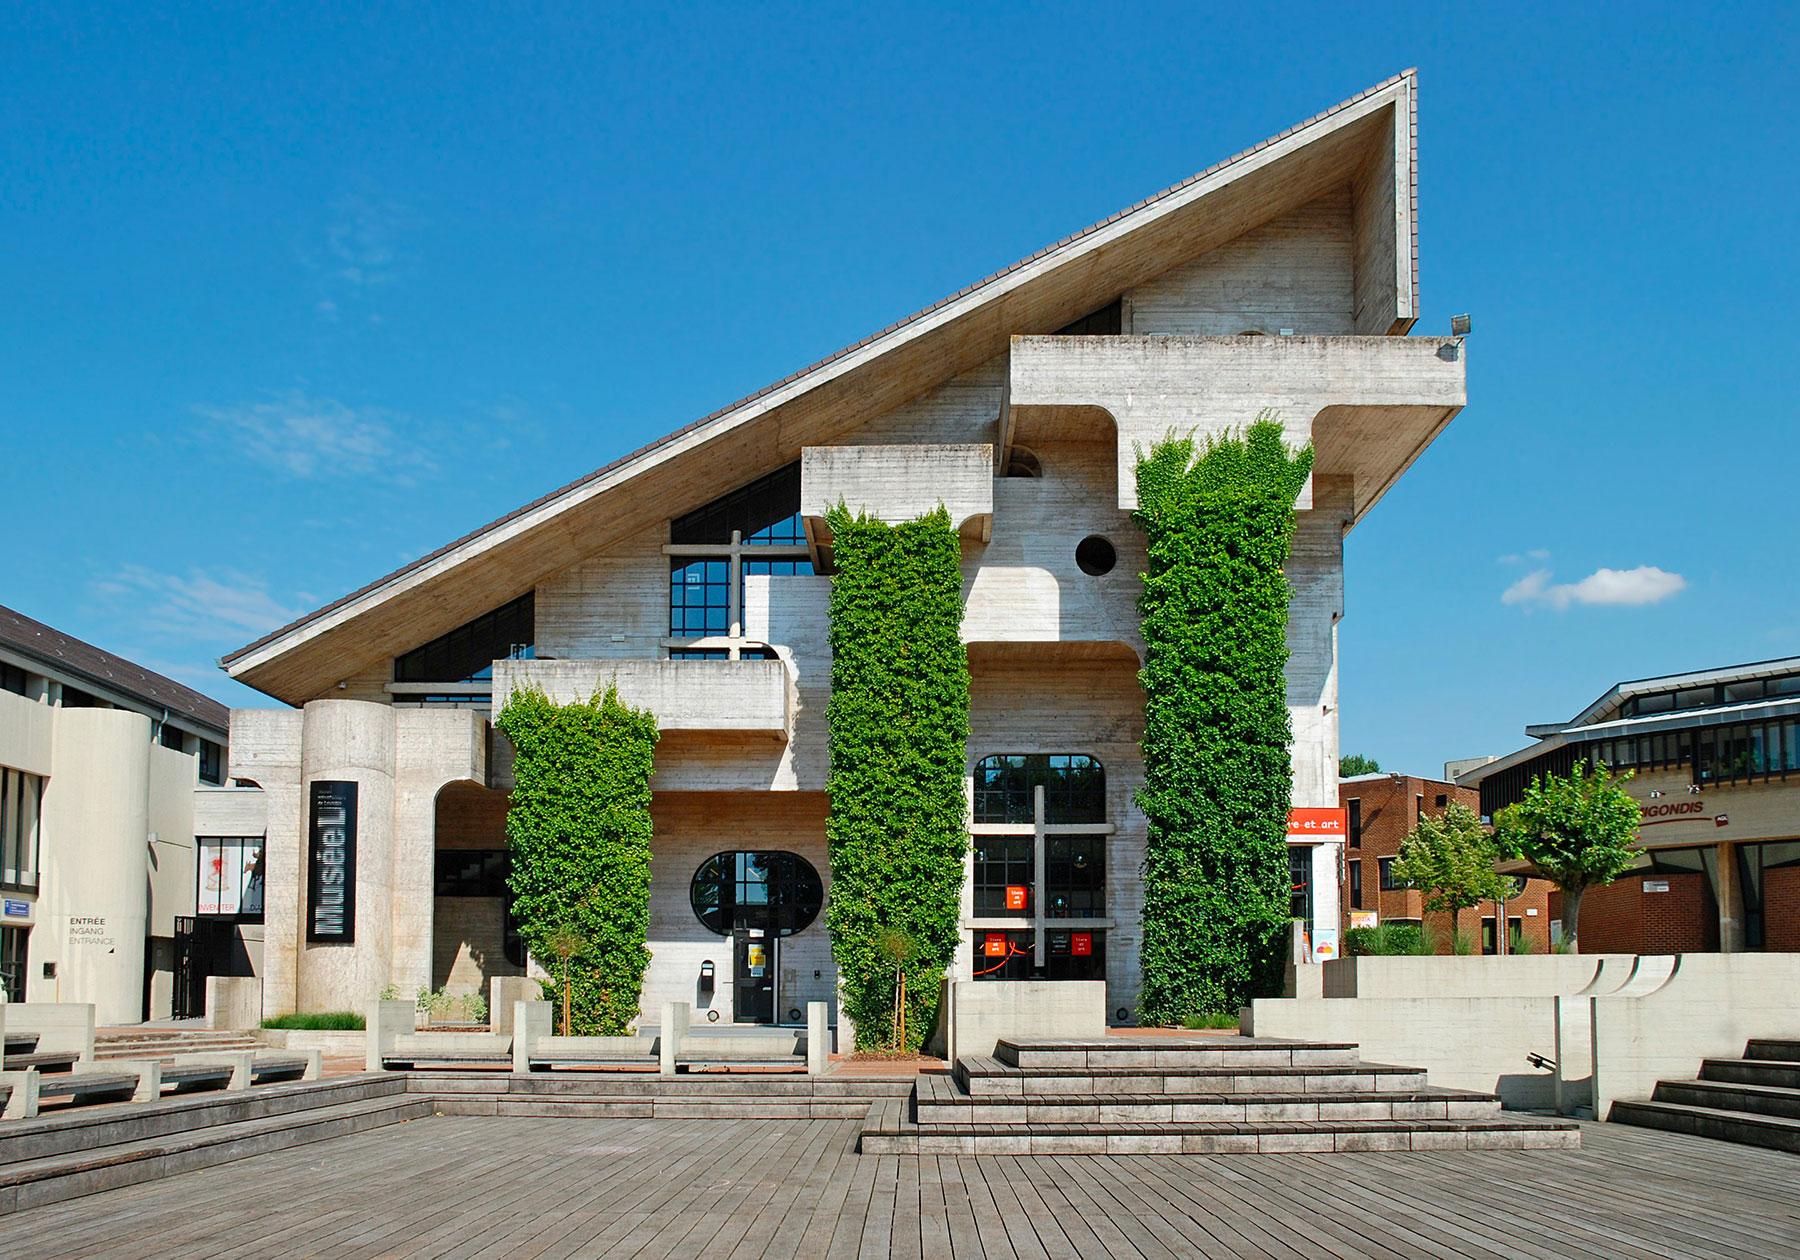 The L Museum in Louvain-la-Neuve